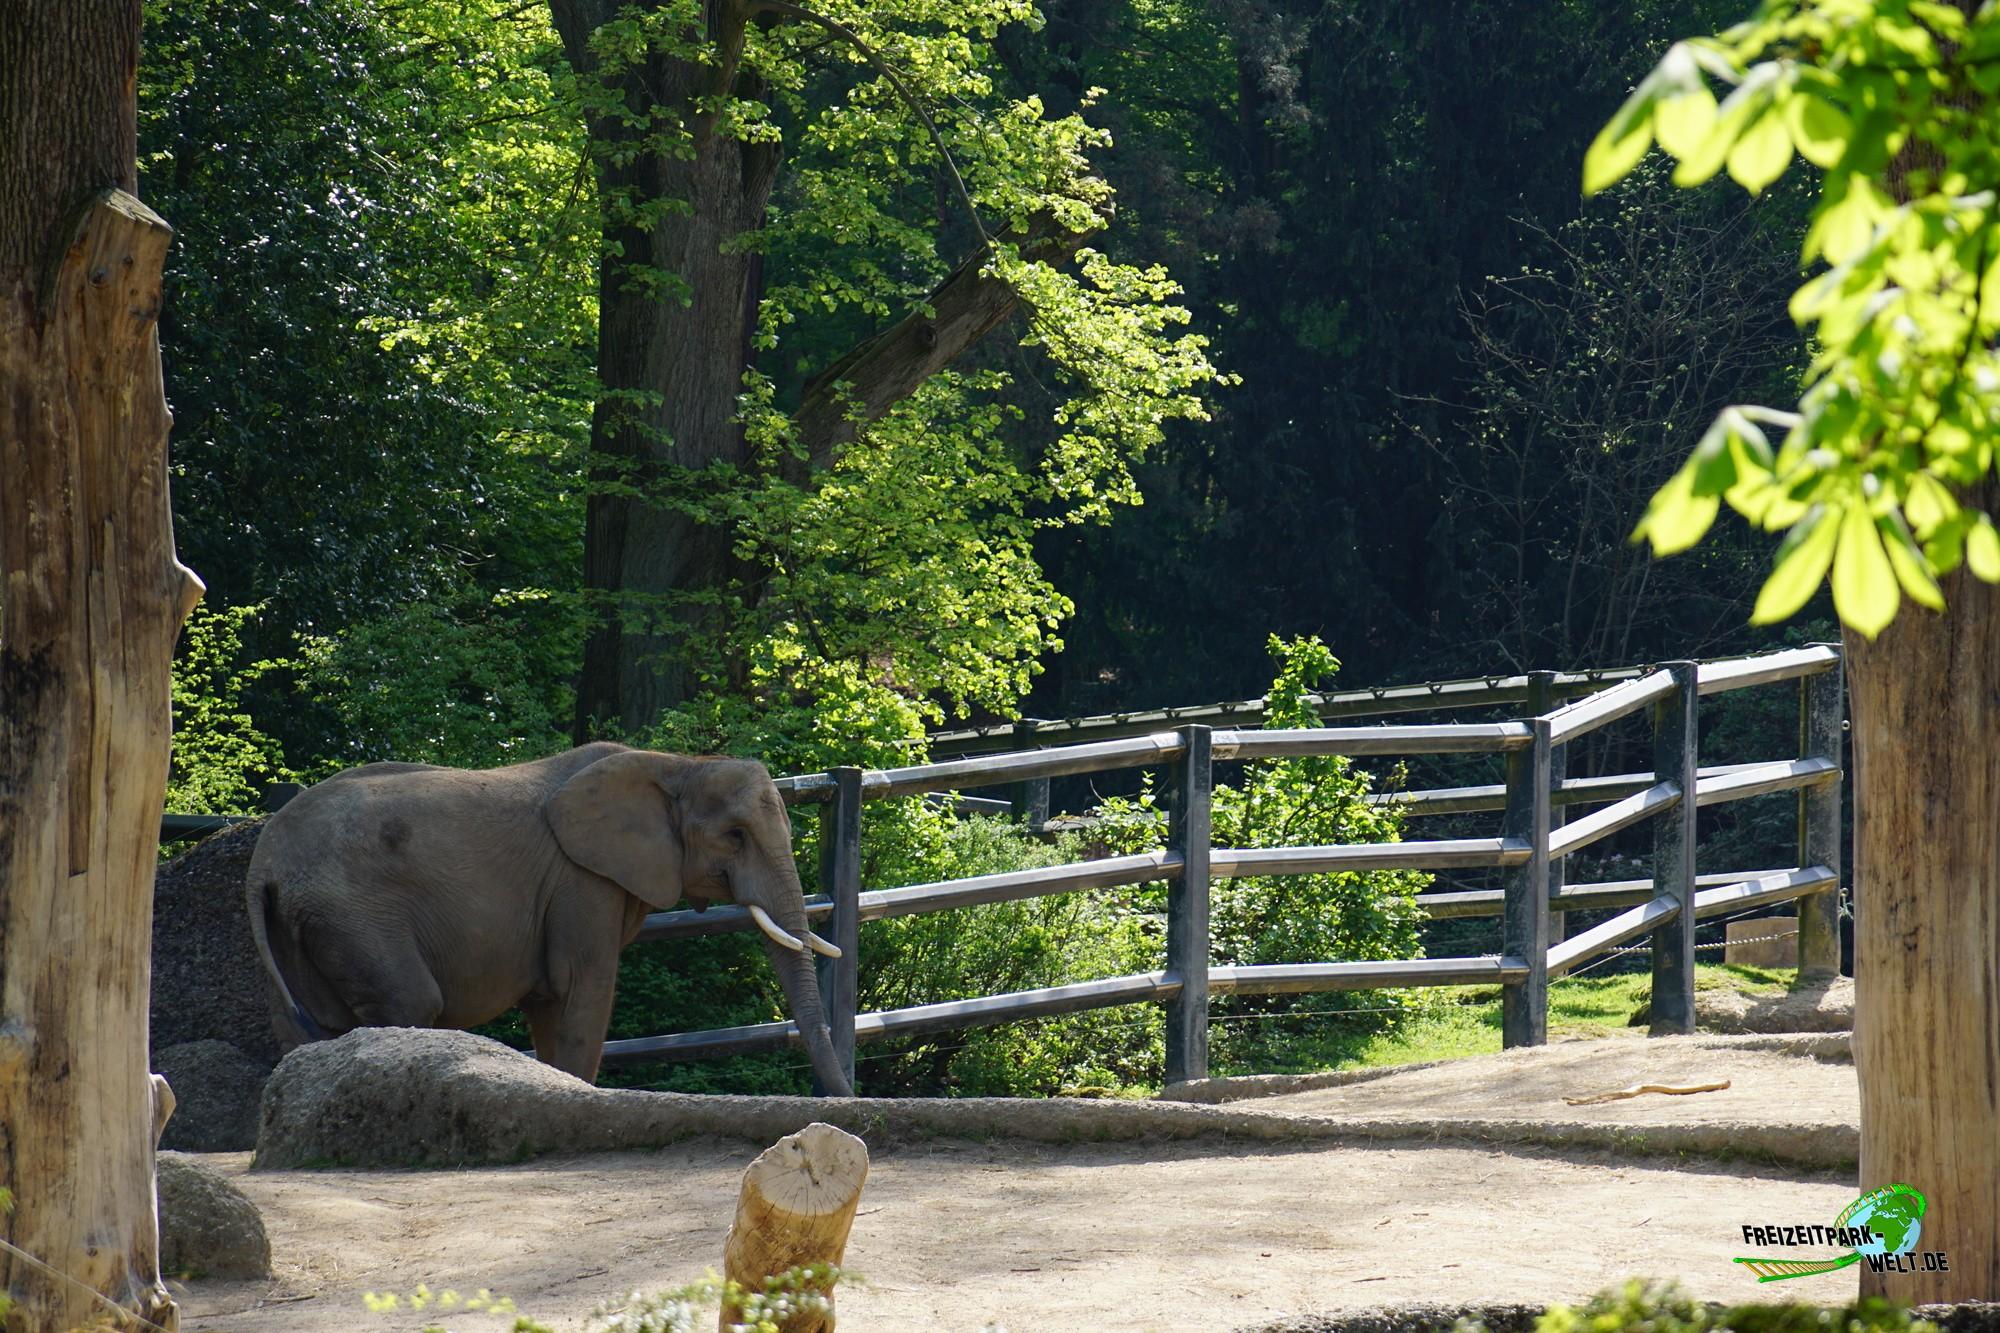 elefanten zoo wuppertal freizeitpark. Black Bedroom Furniture Sets. Home Design Ideas